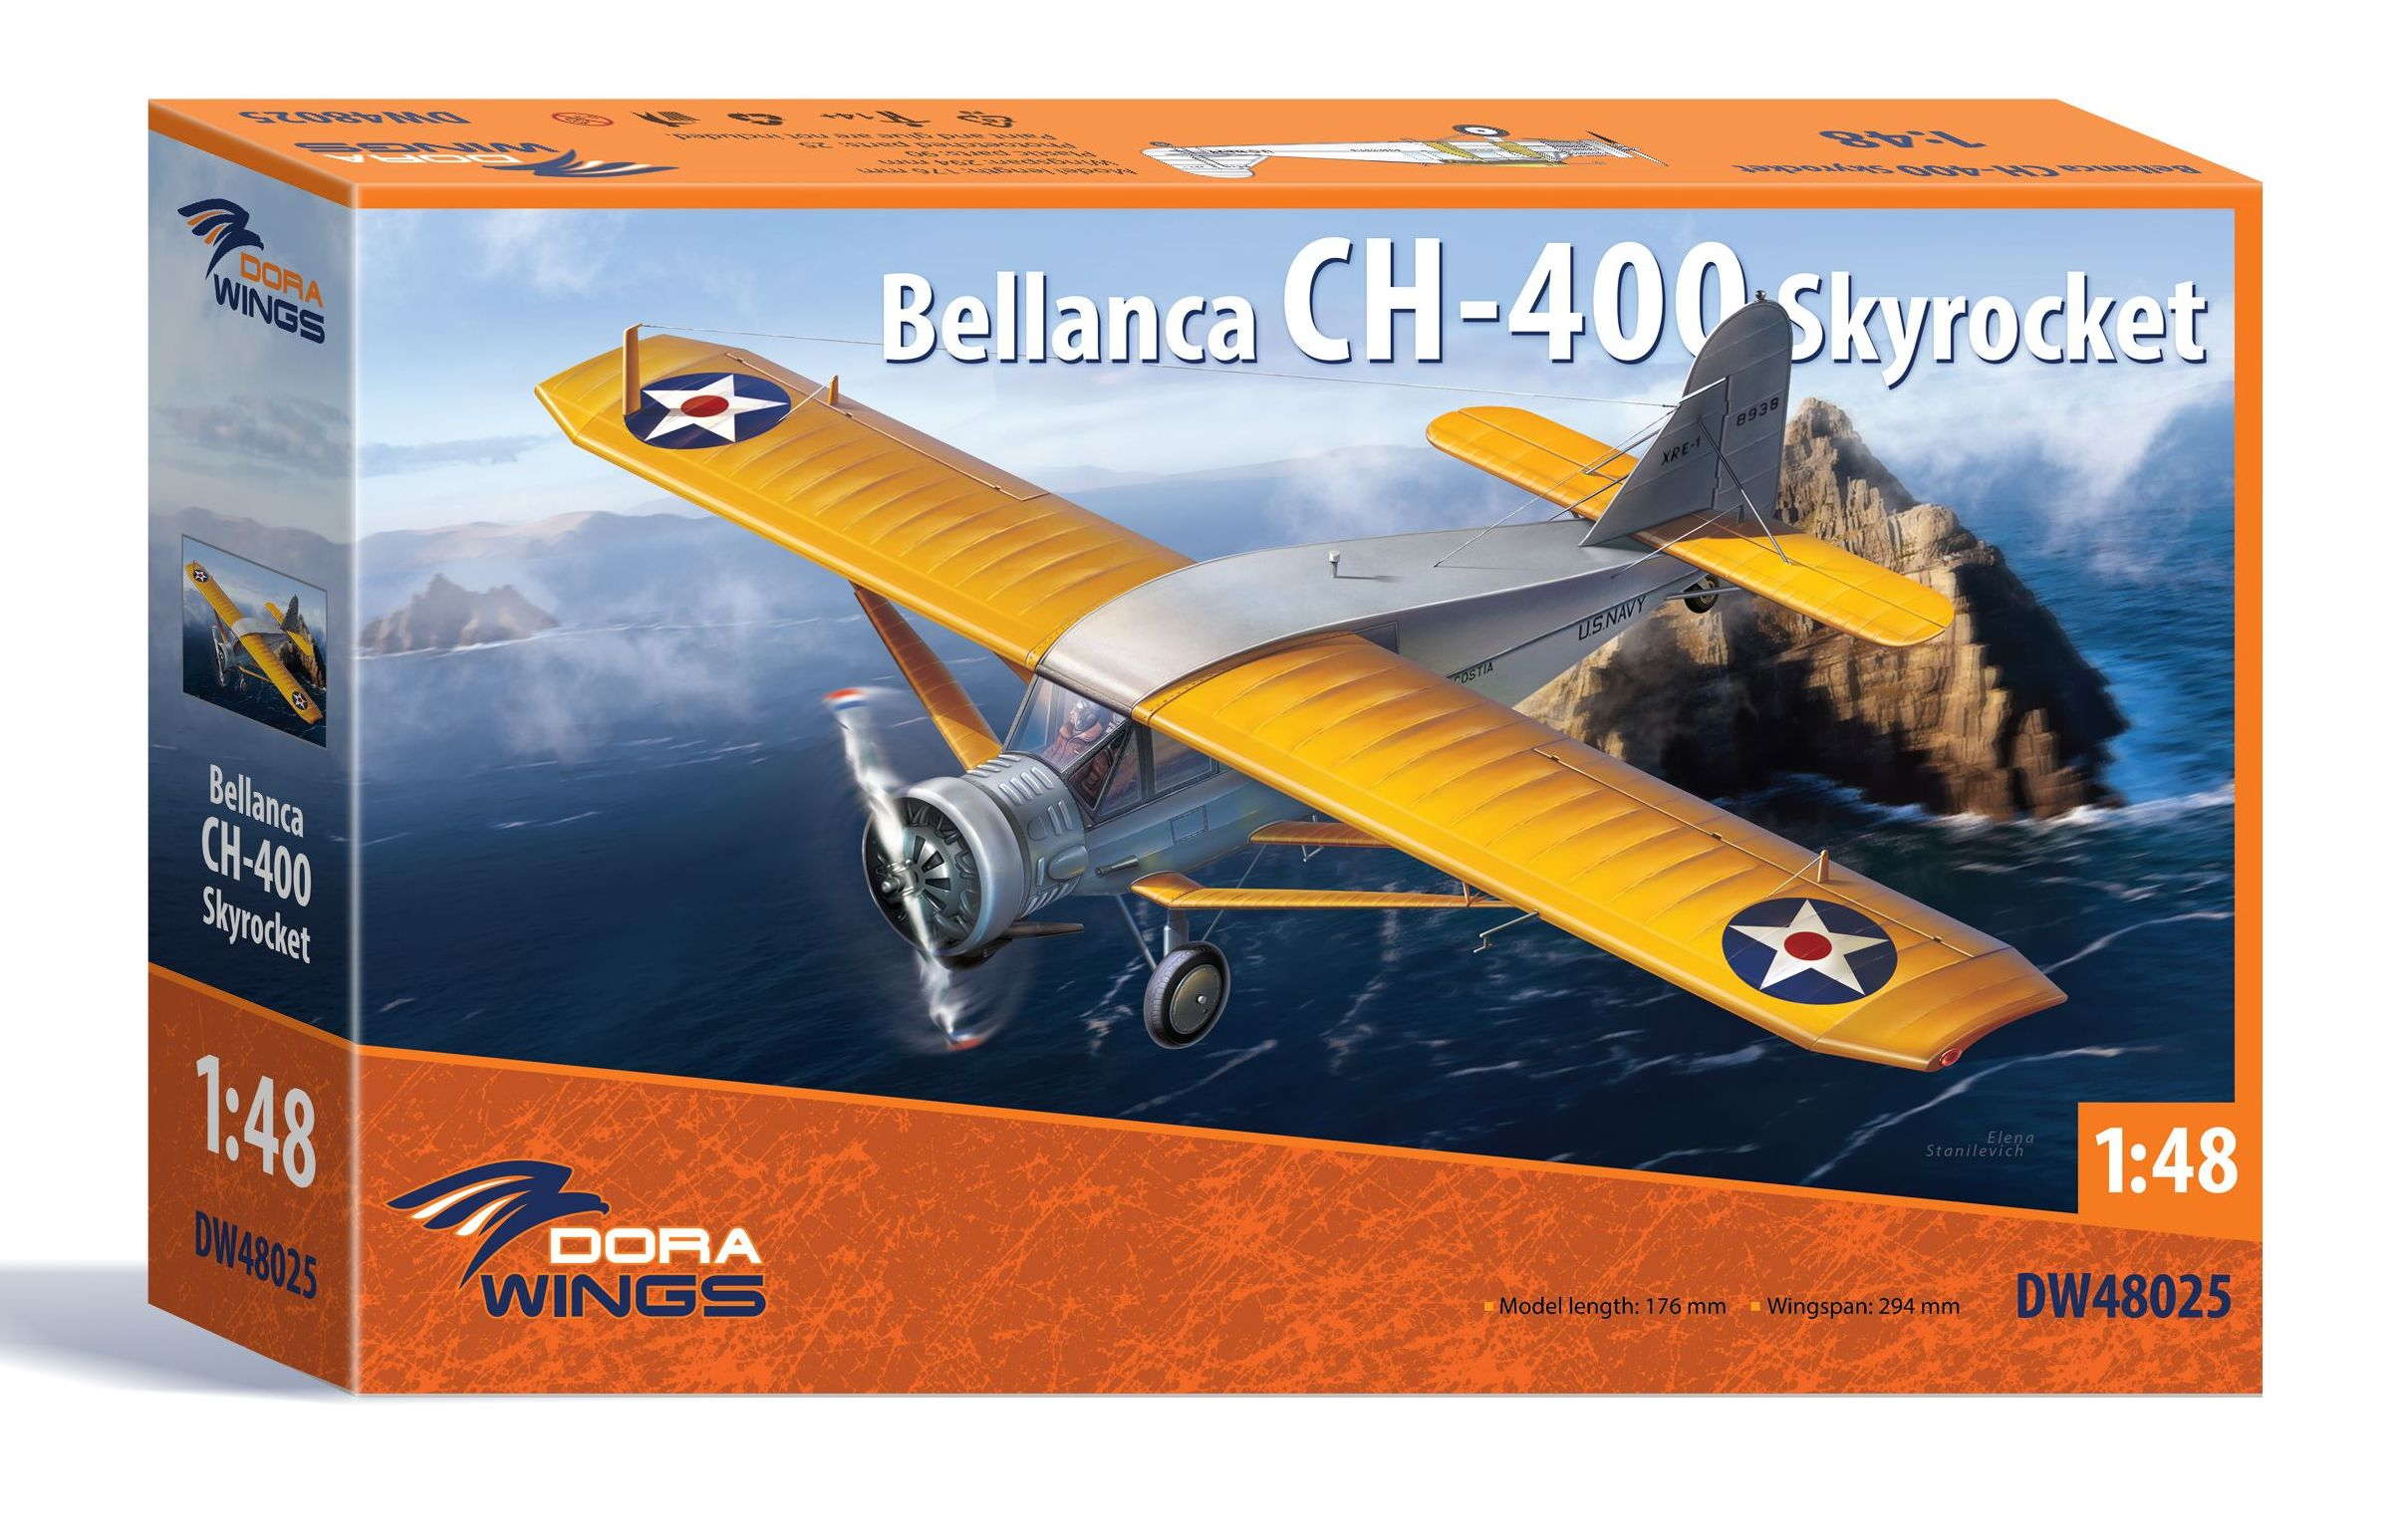 Dora Wings 1/48 Bellanca CH-400 Skyrocket